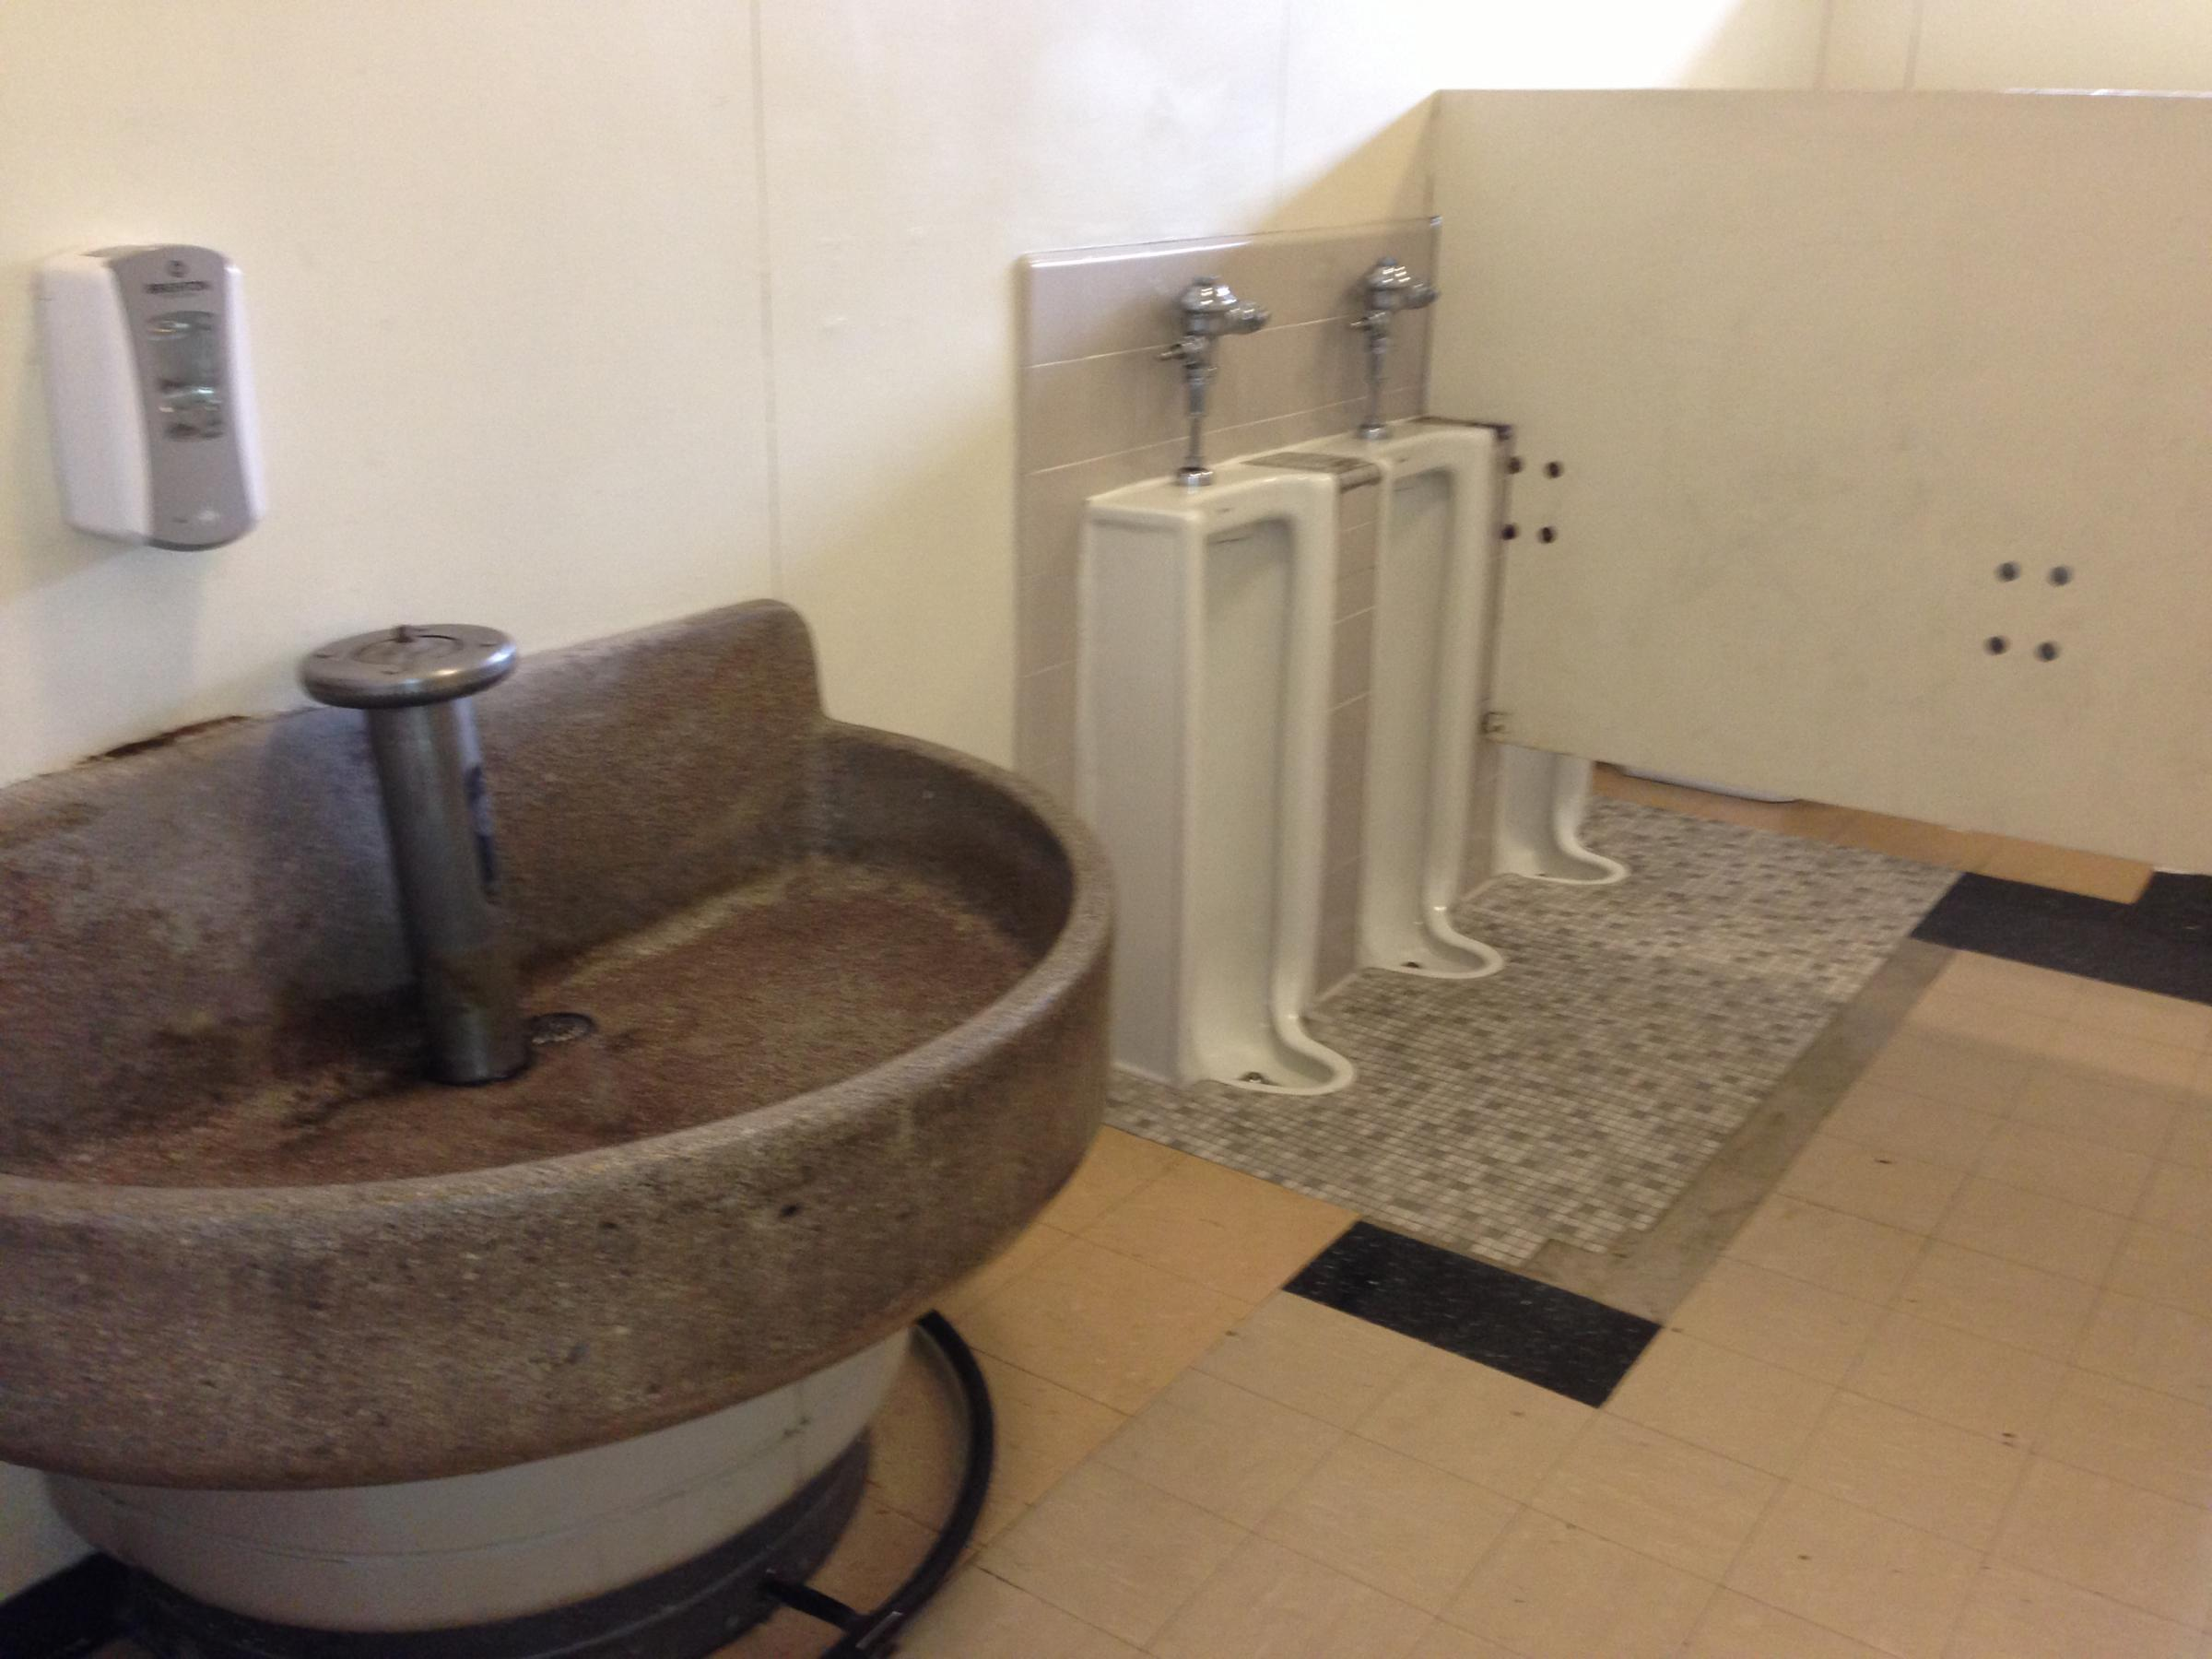 Elementary school bathroom urinal - Boy S Bathroom At Hamlin Middle School